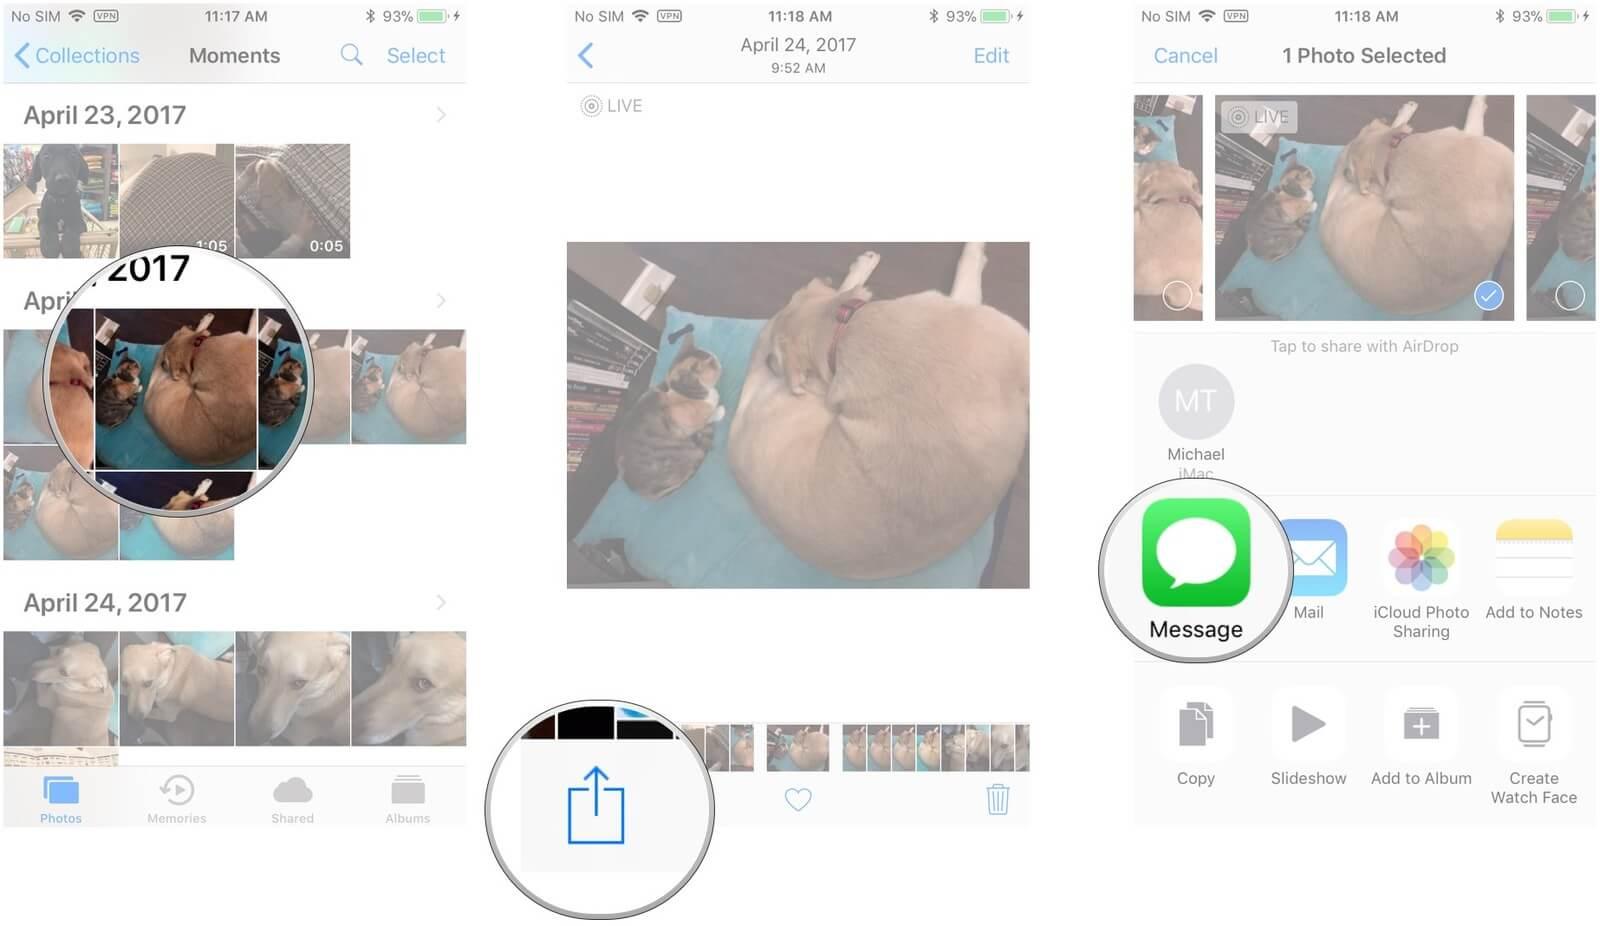 Share-Live-Fotos-zu-Social-Media-Plattformen